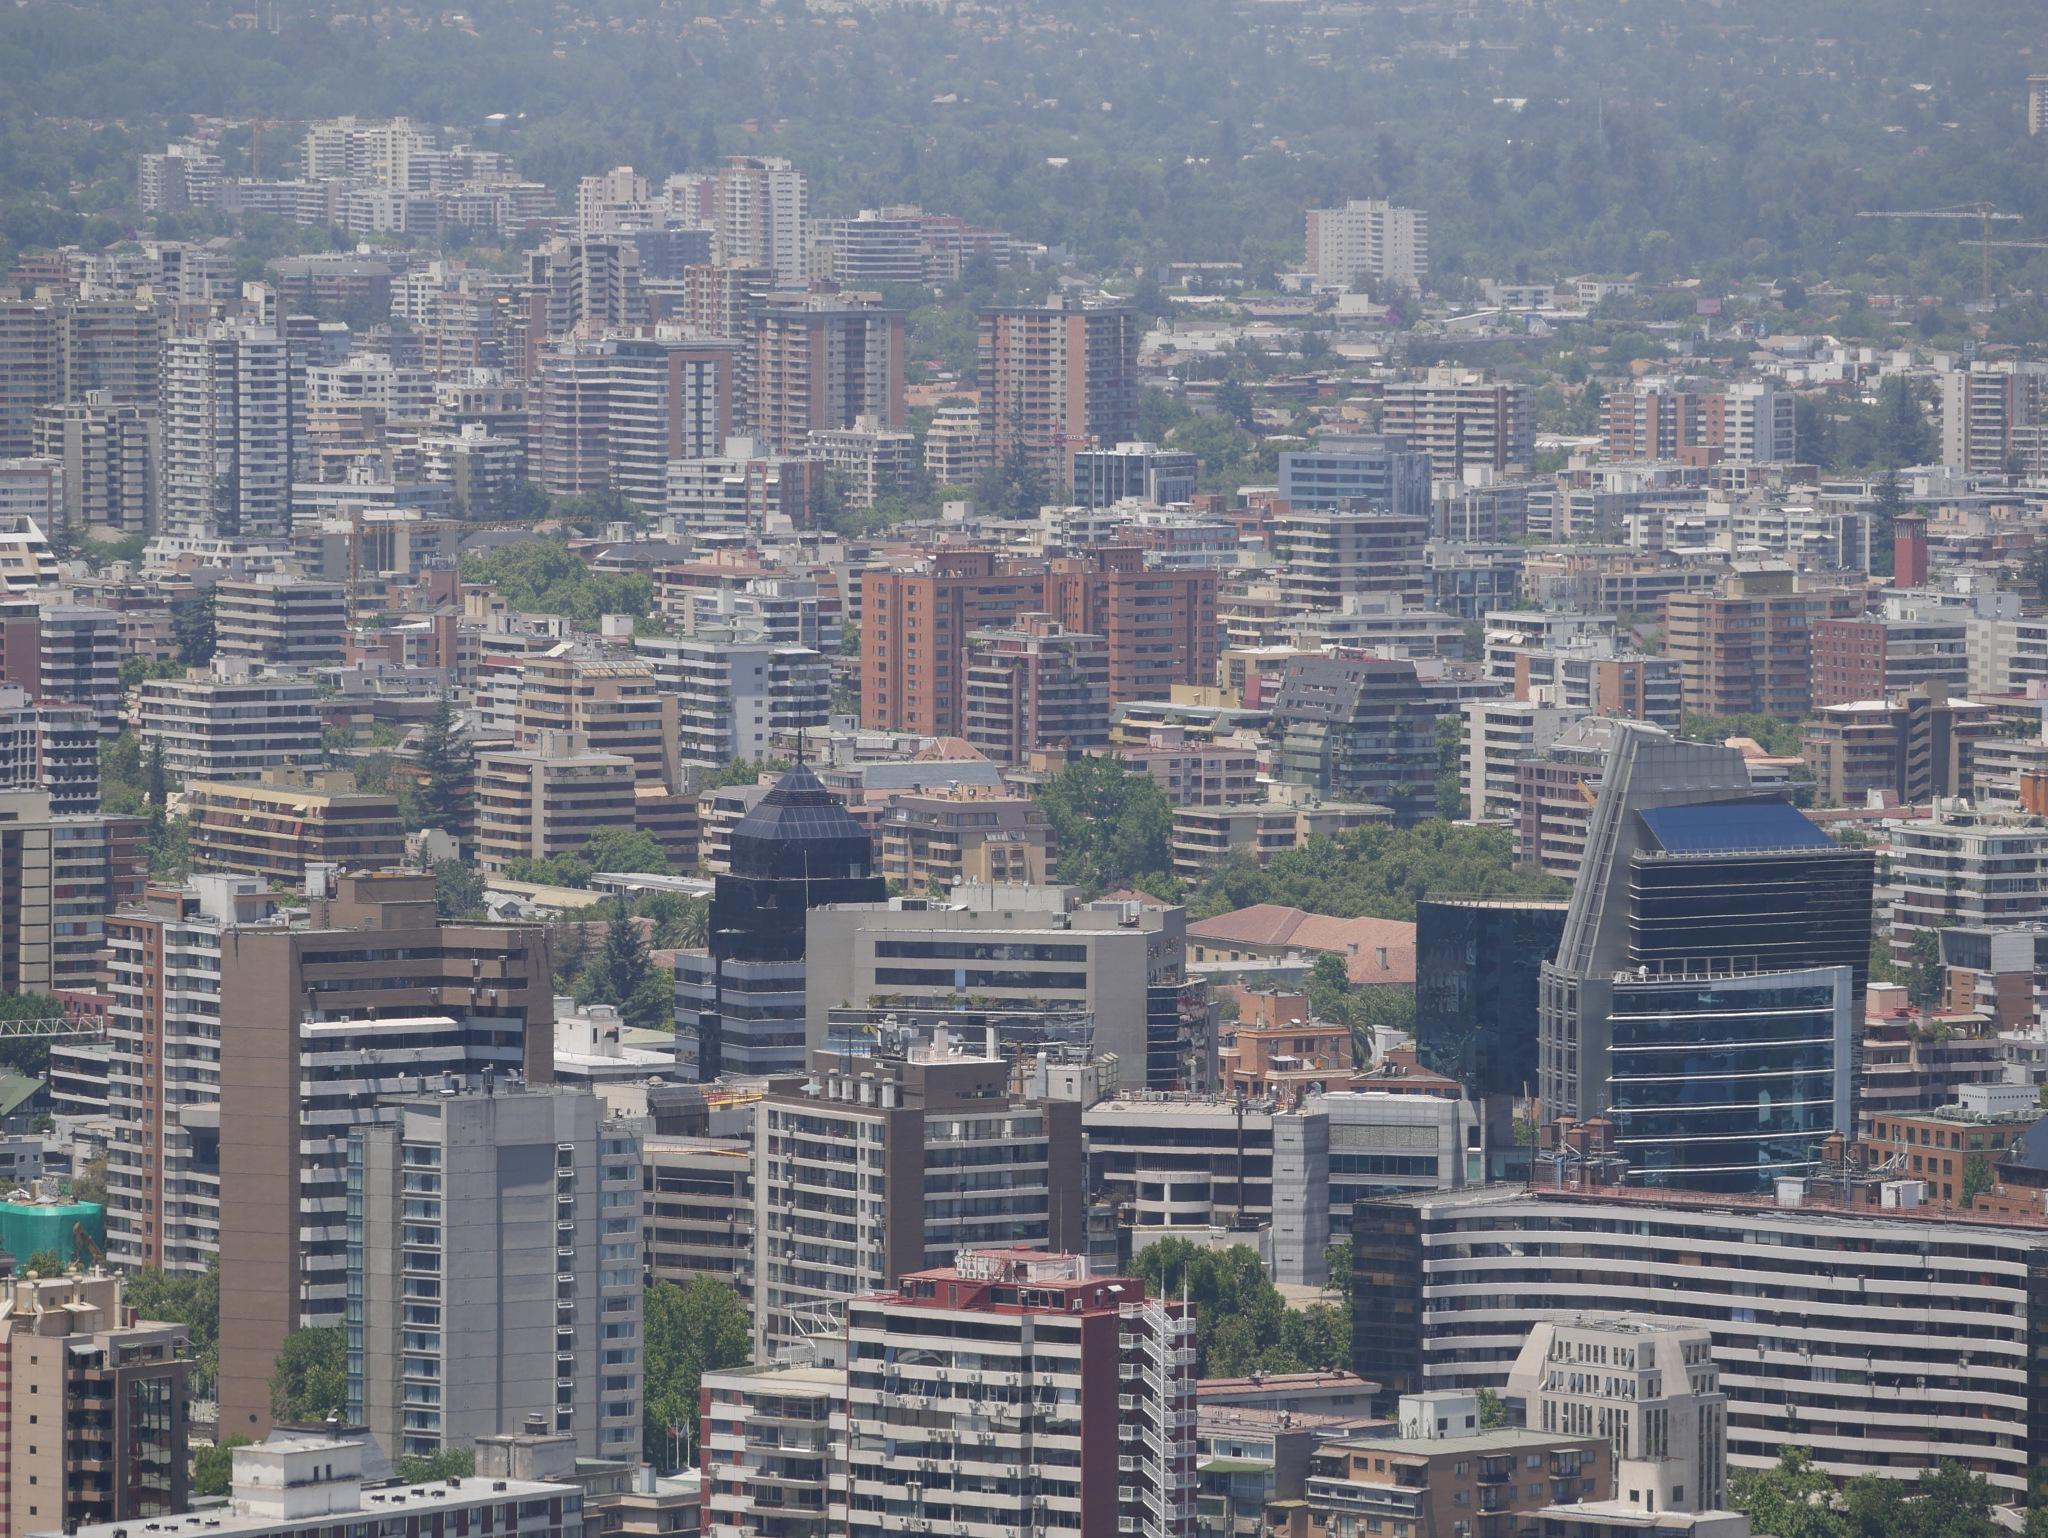 The big city by Anibal Aguillon Salazar